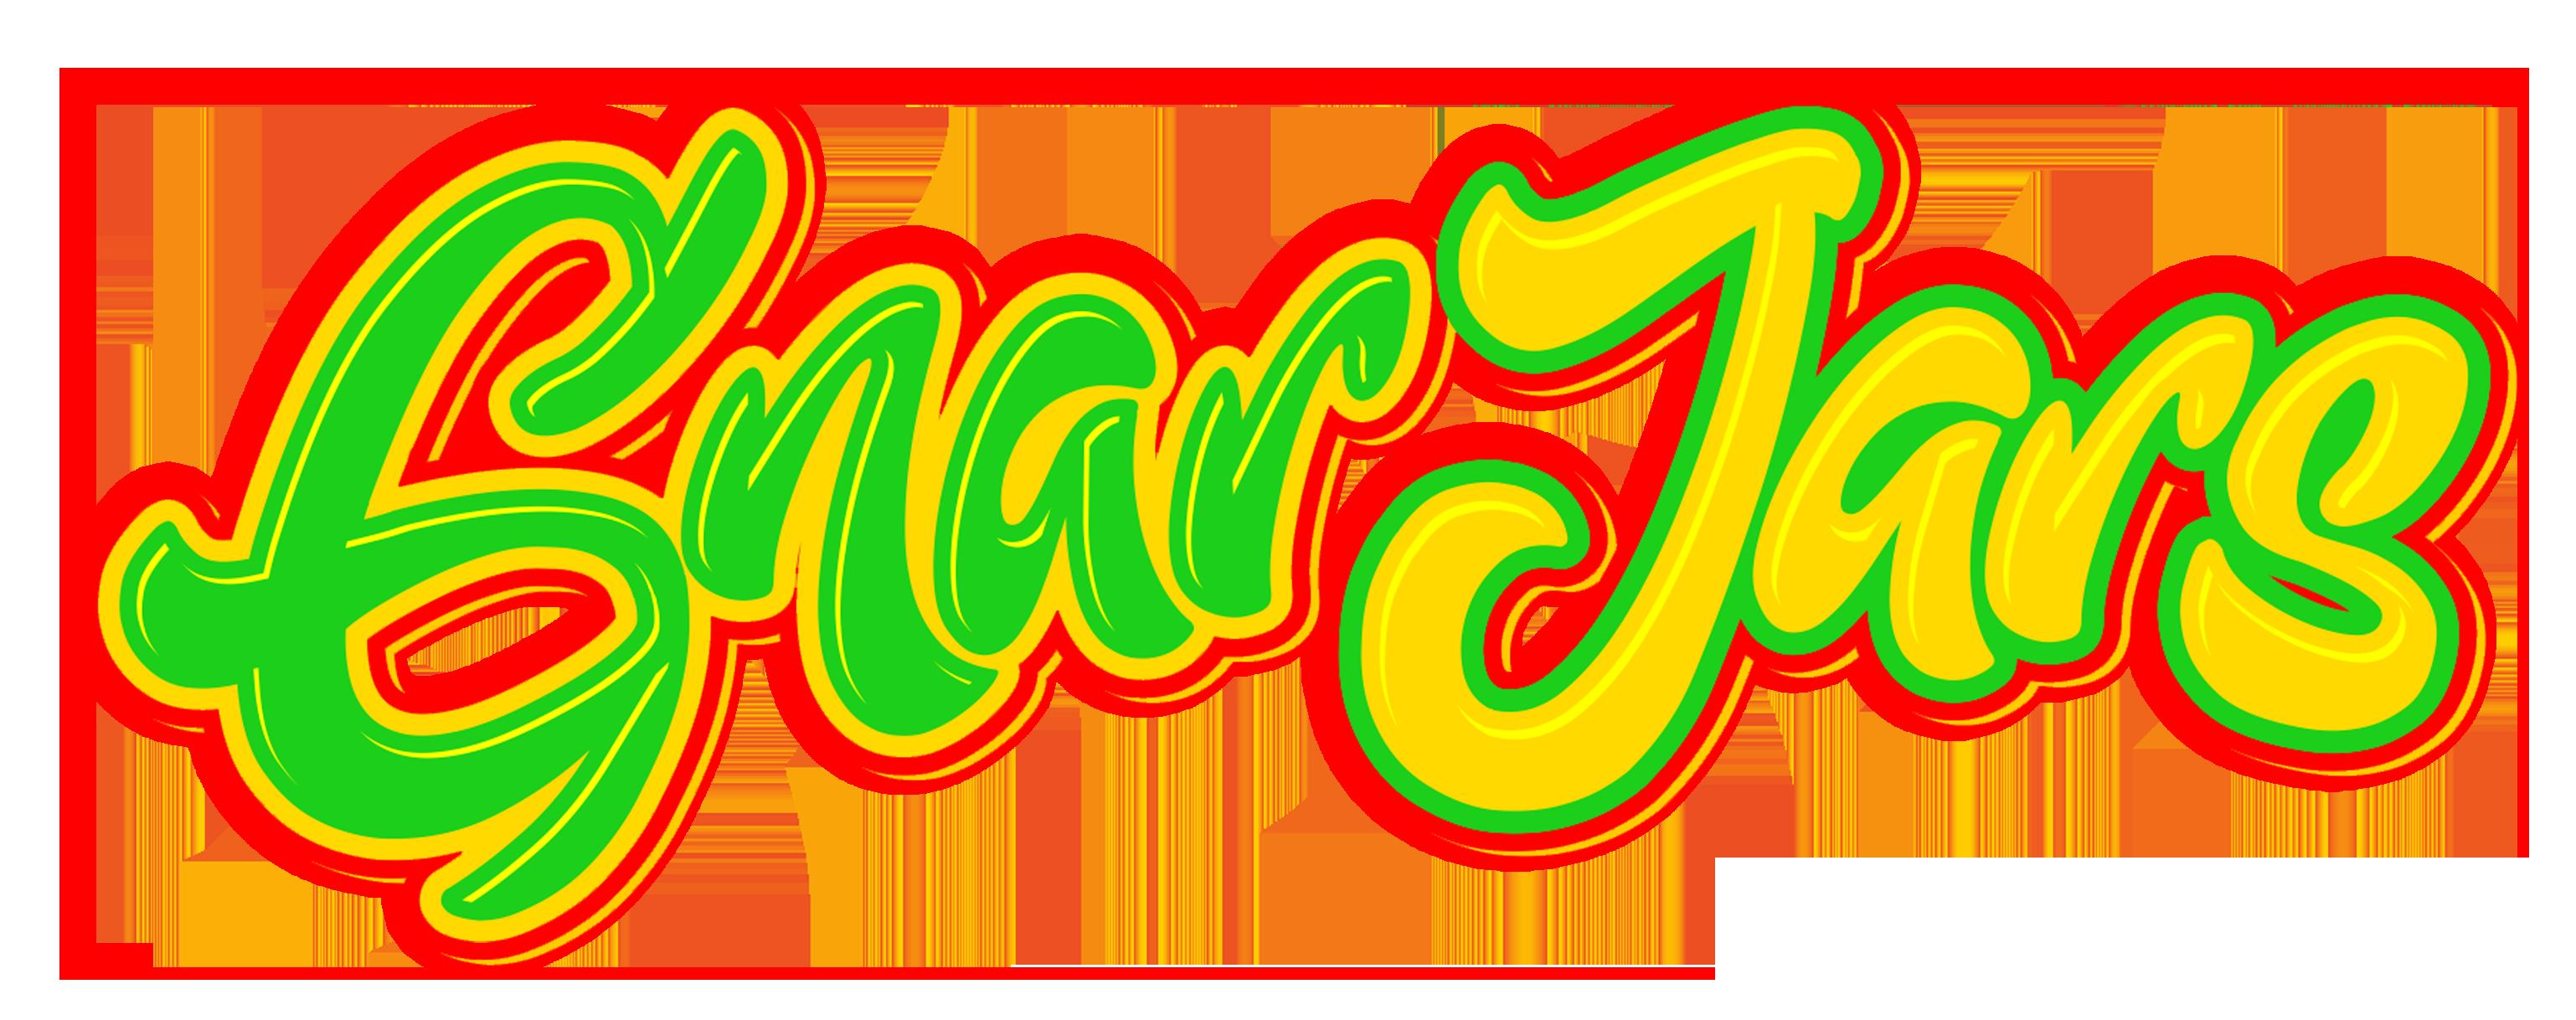 GnarJars